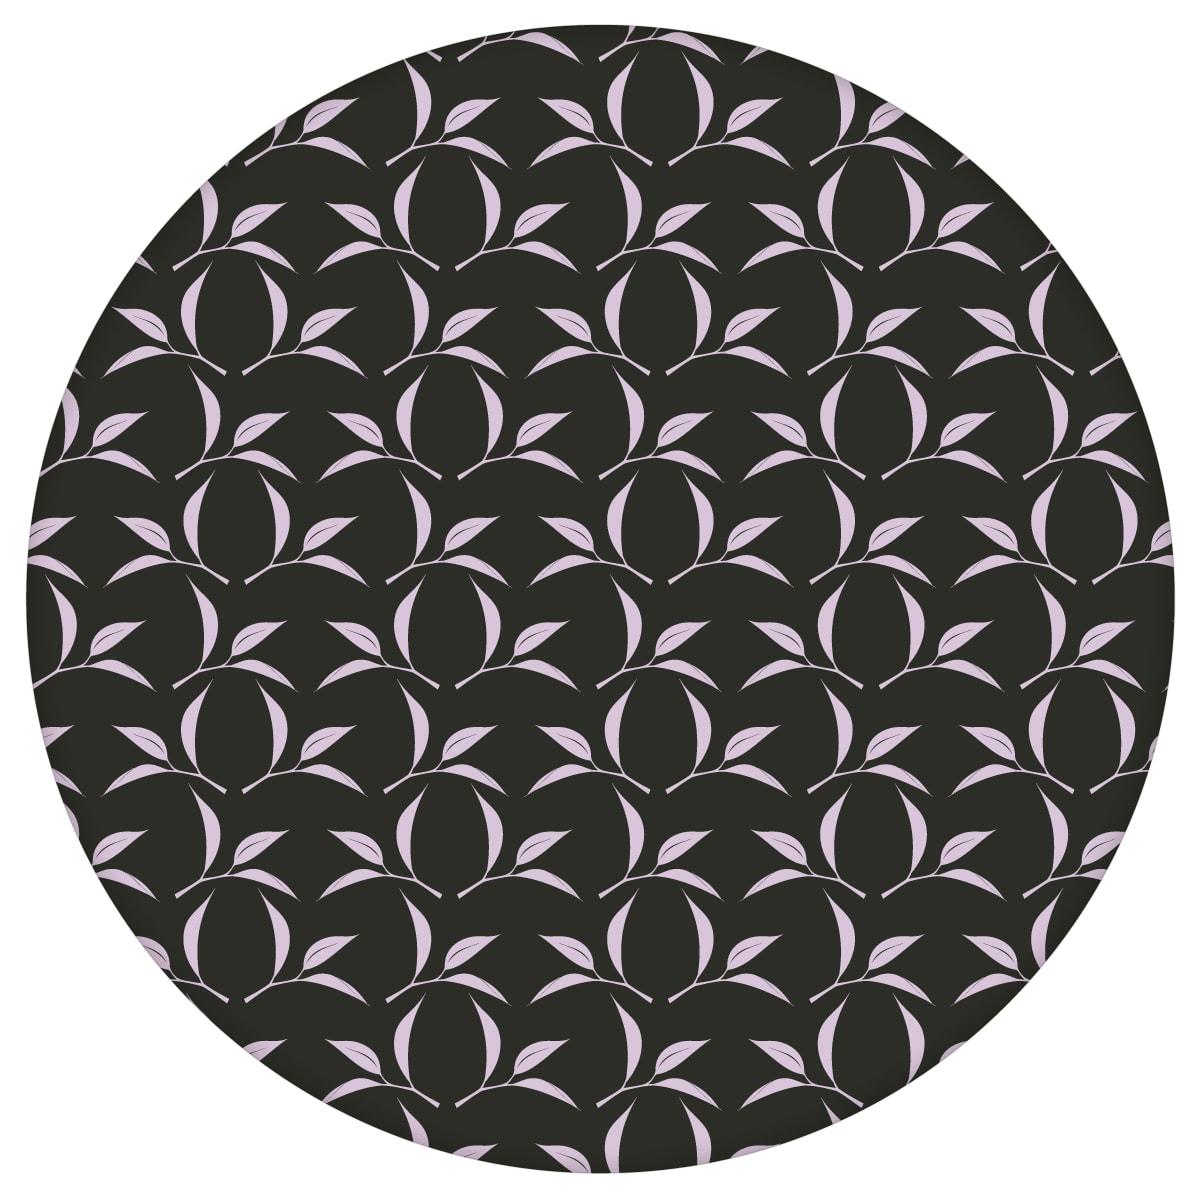 Tee Blatt Ornamenttapete Tea Time in schwarz - Design Tapete für Flur, Büro